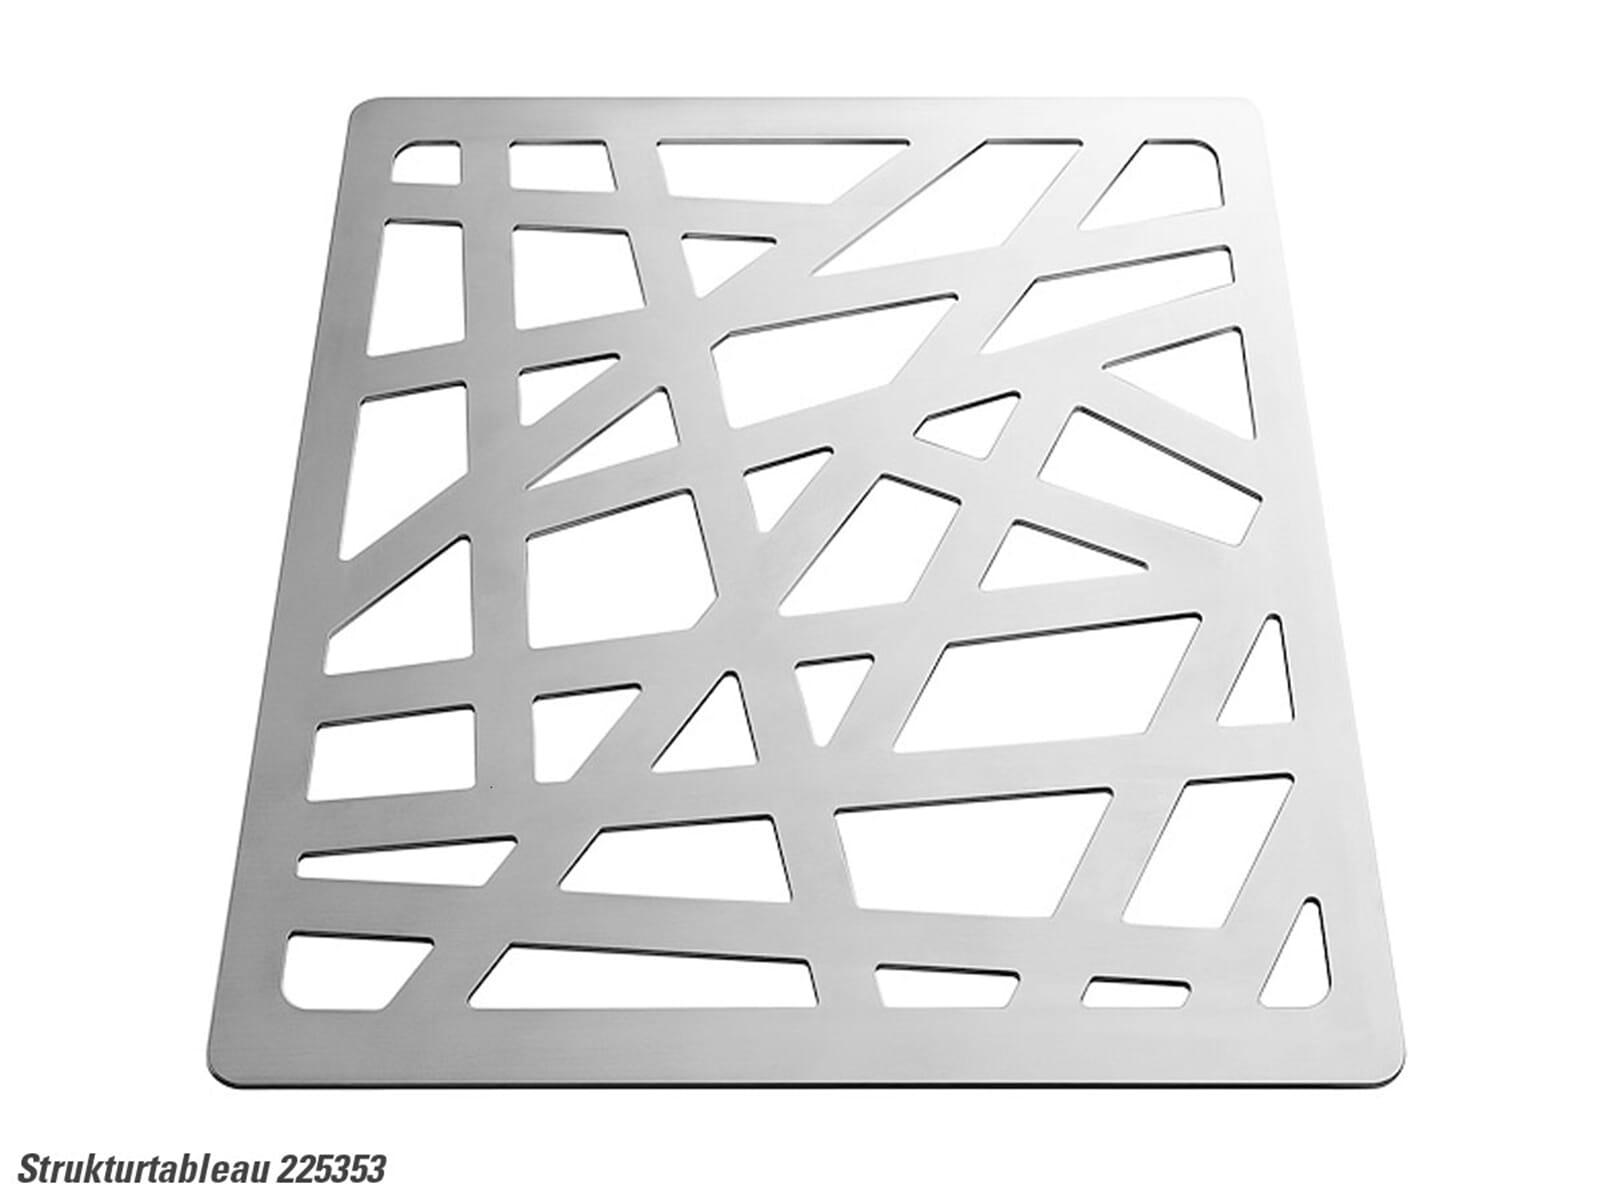 Blanco 225 353 Strukturtableau Edelstahl